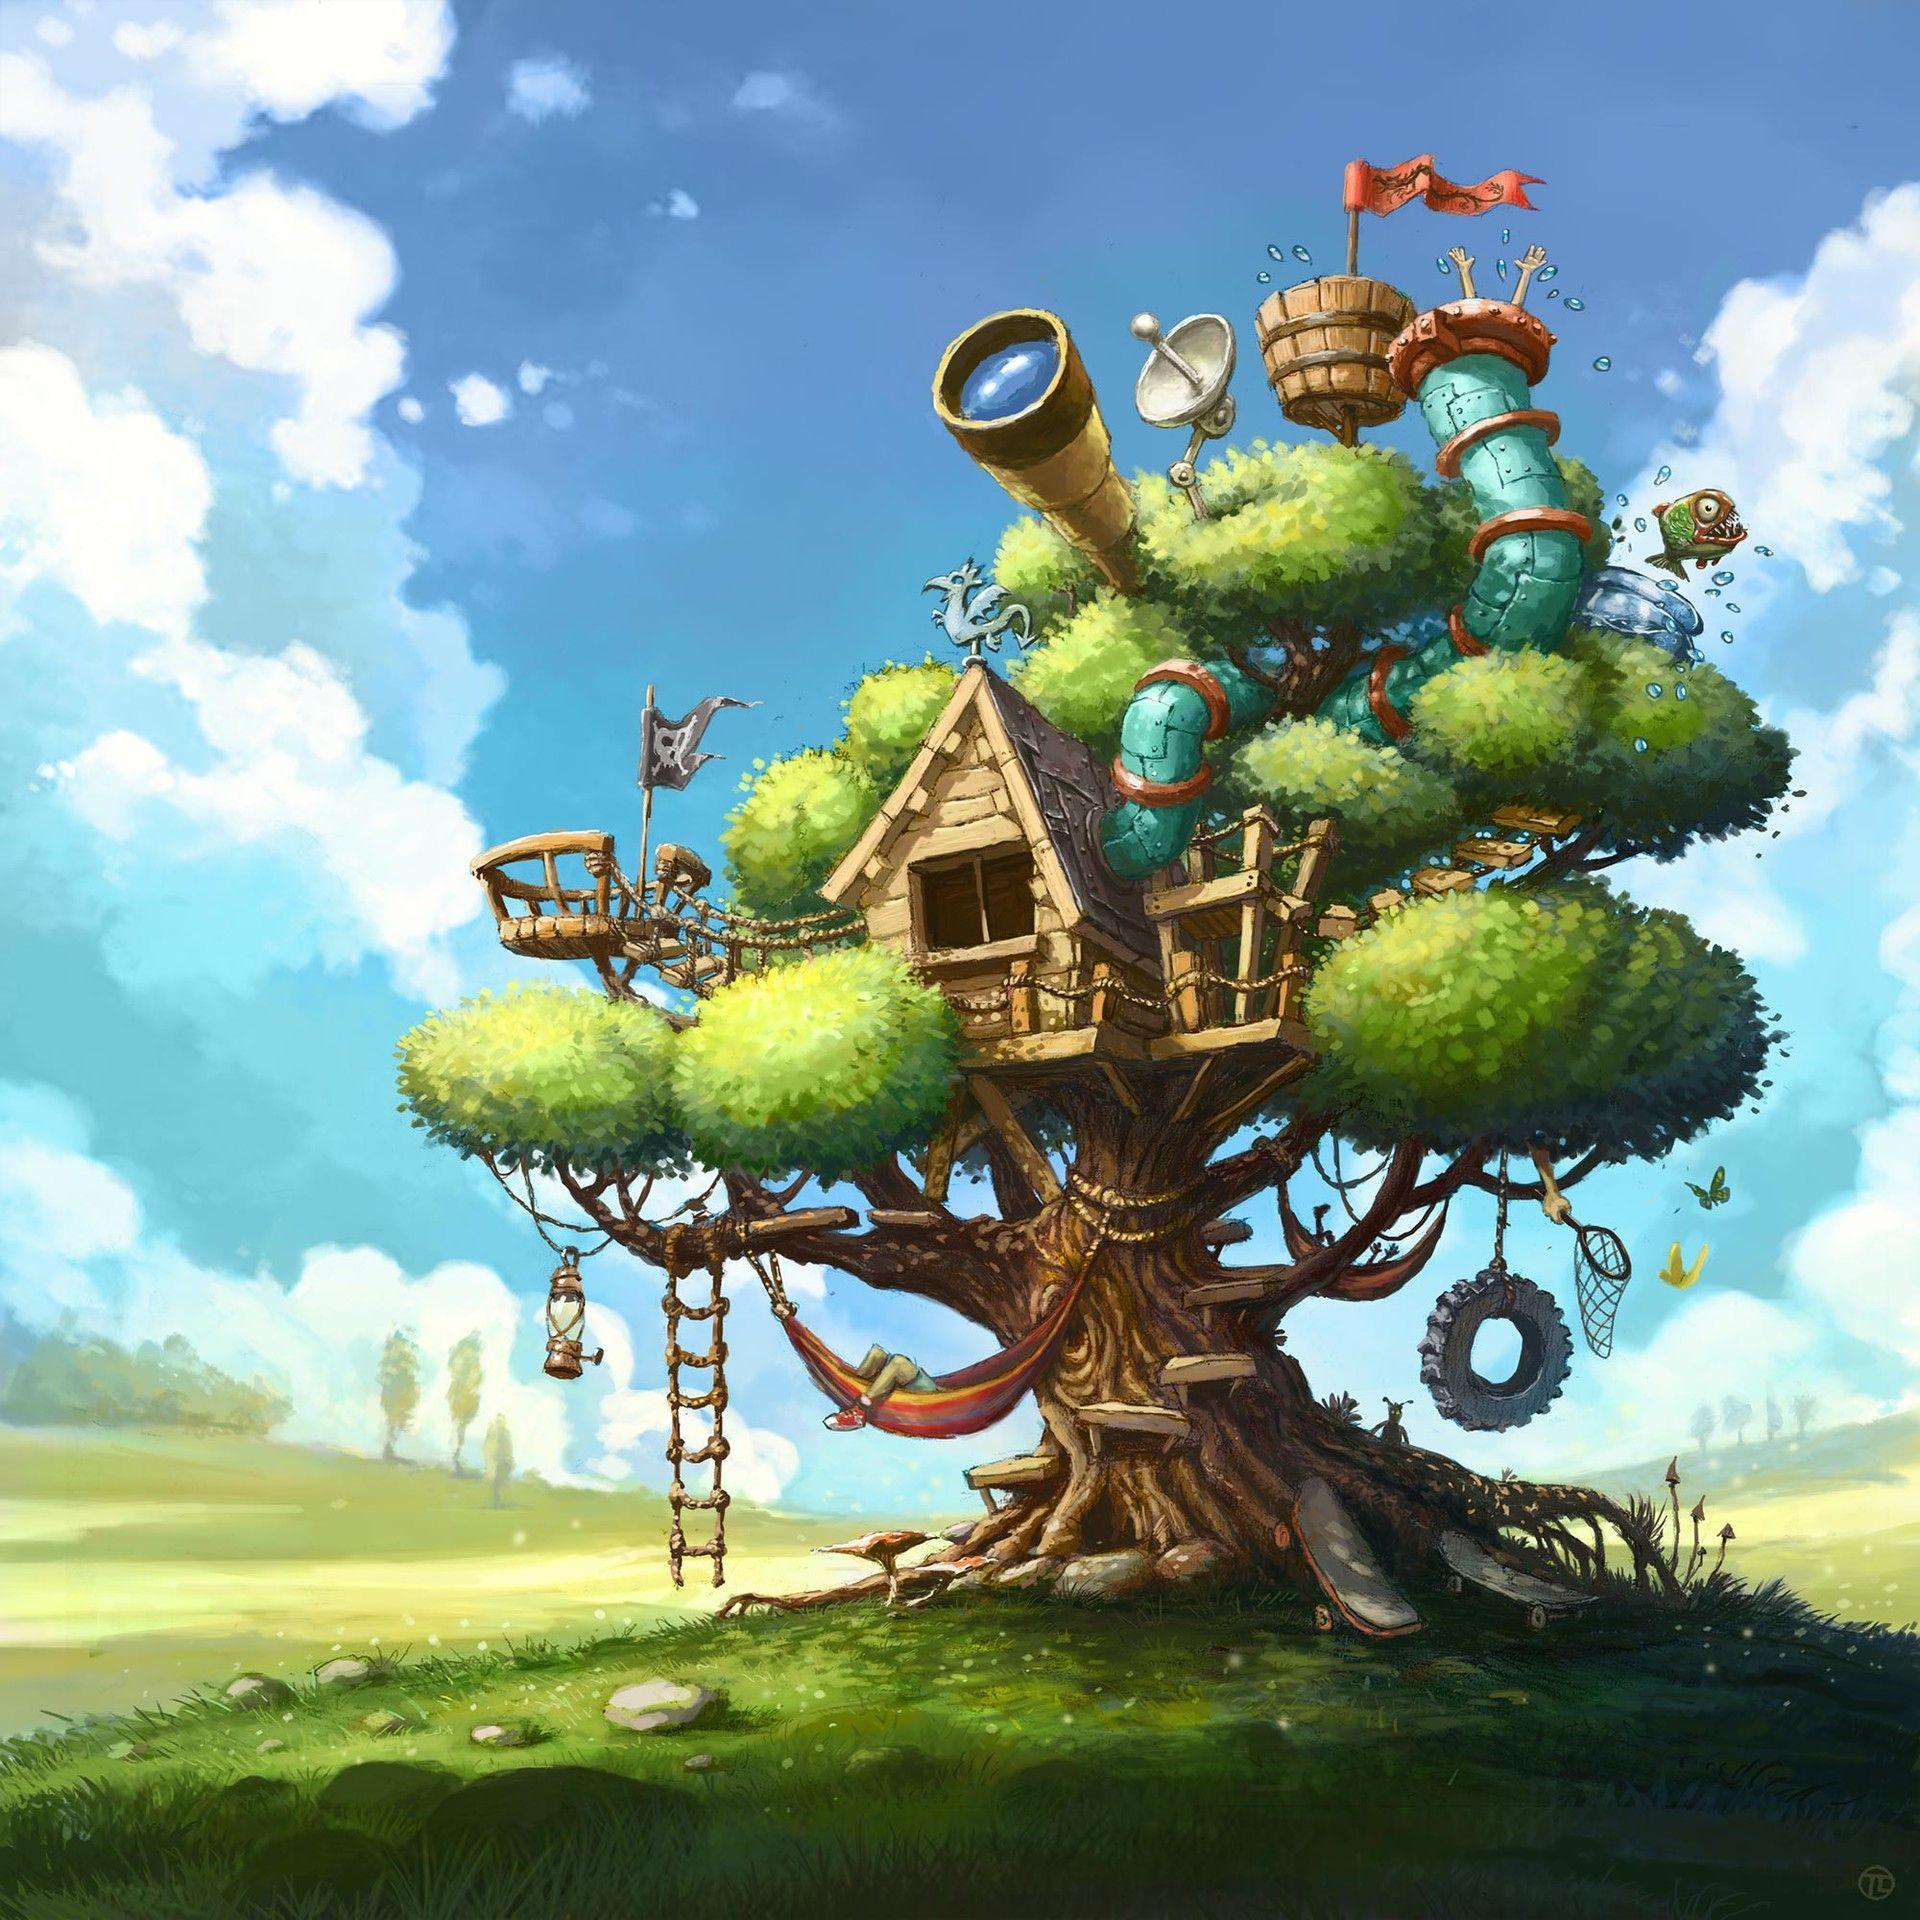 ArtStation - Best Tree House ever :), Tomek Larek